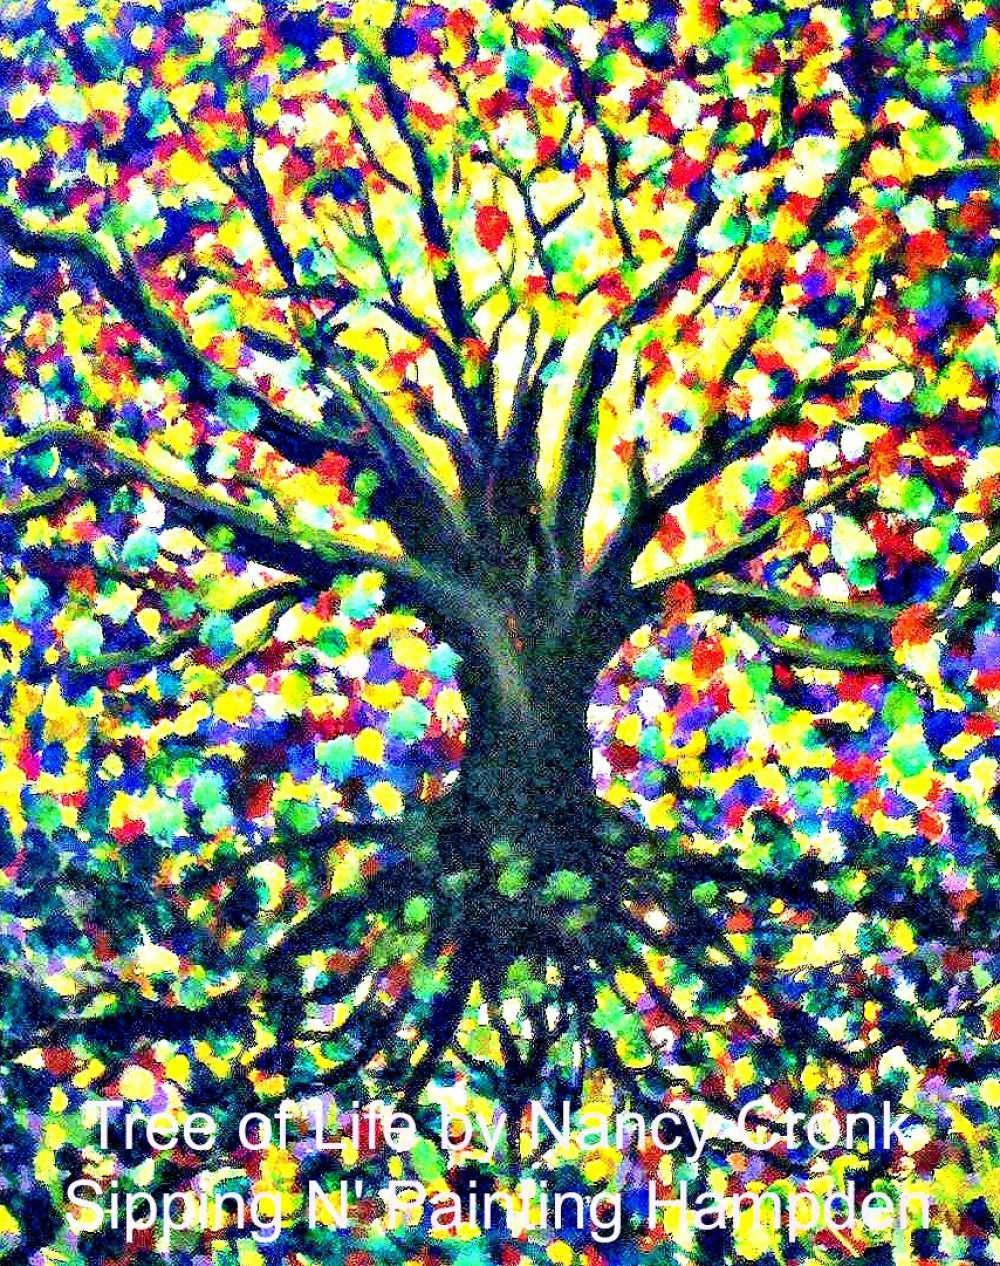 Paint Wine Denver Tree of Life Fri June 12th 6:30pm $35